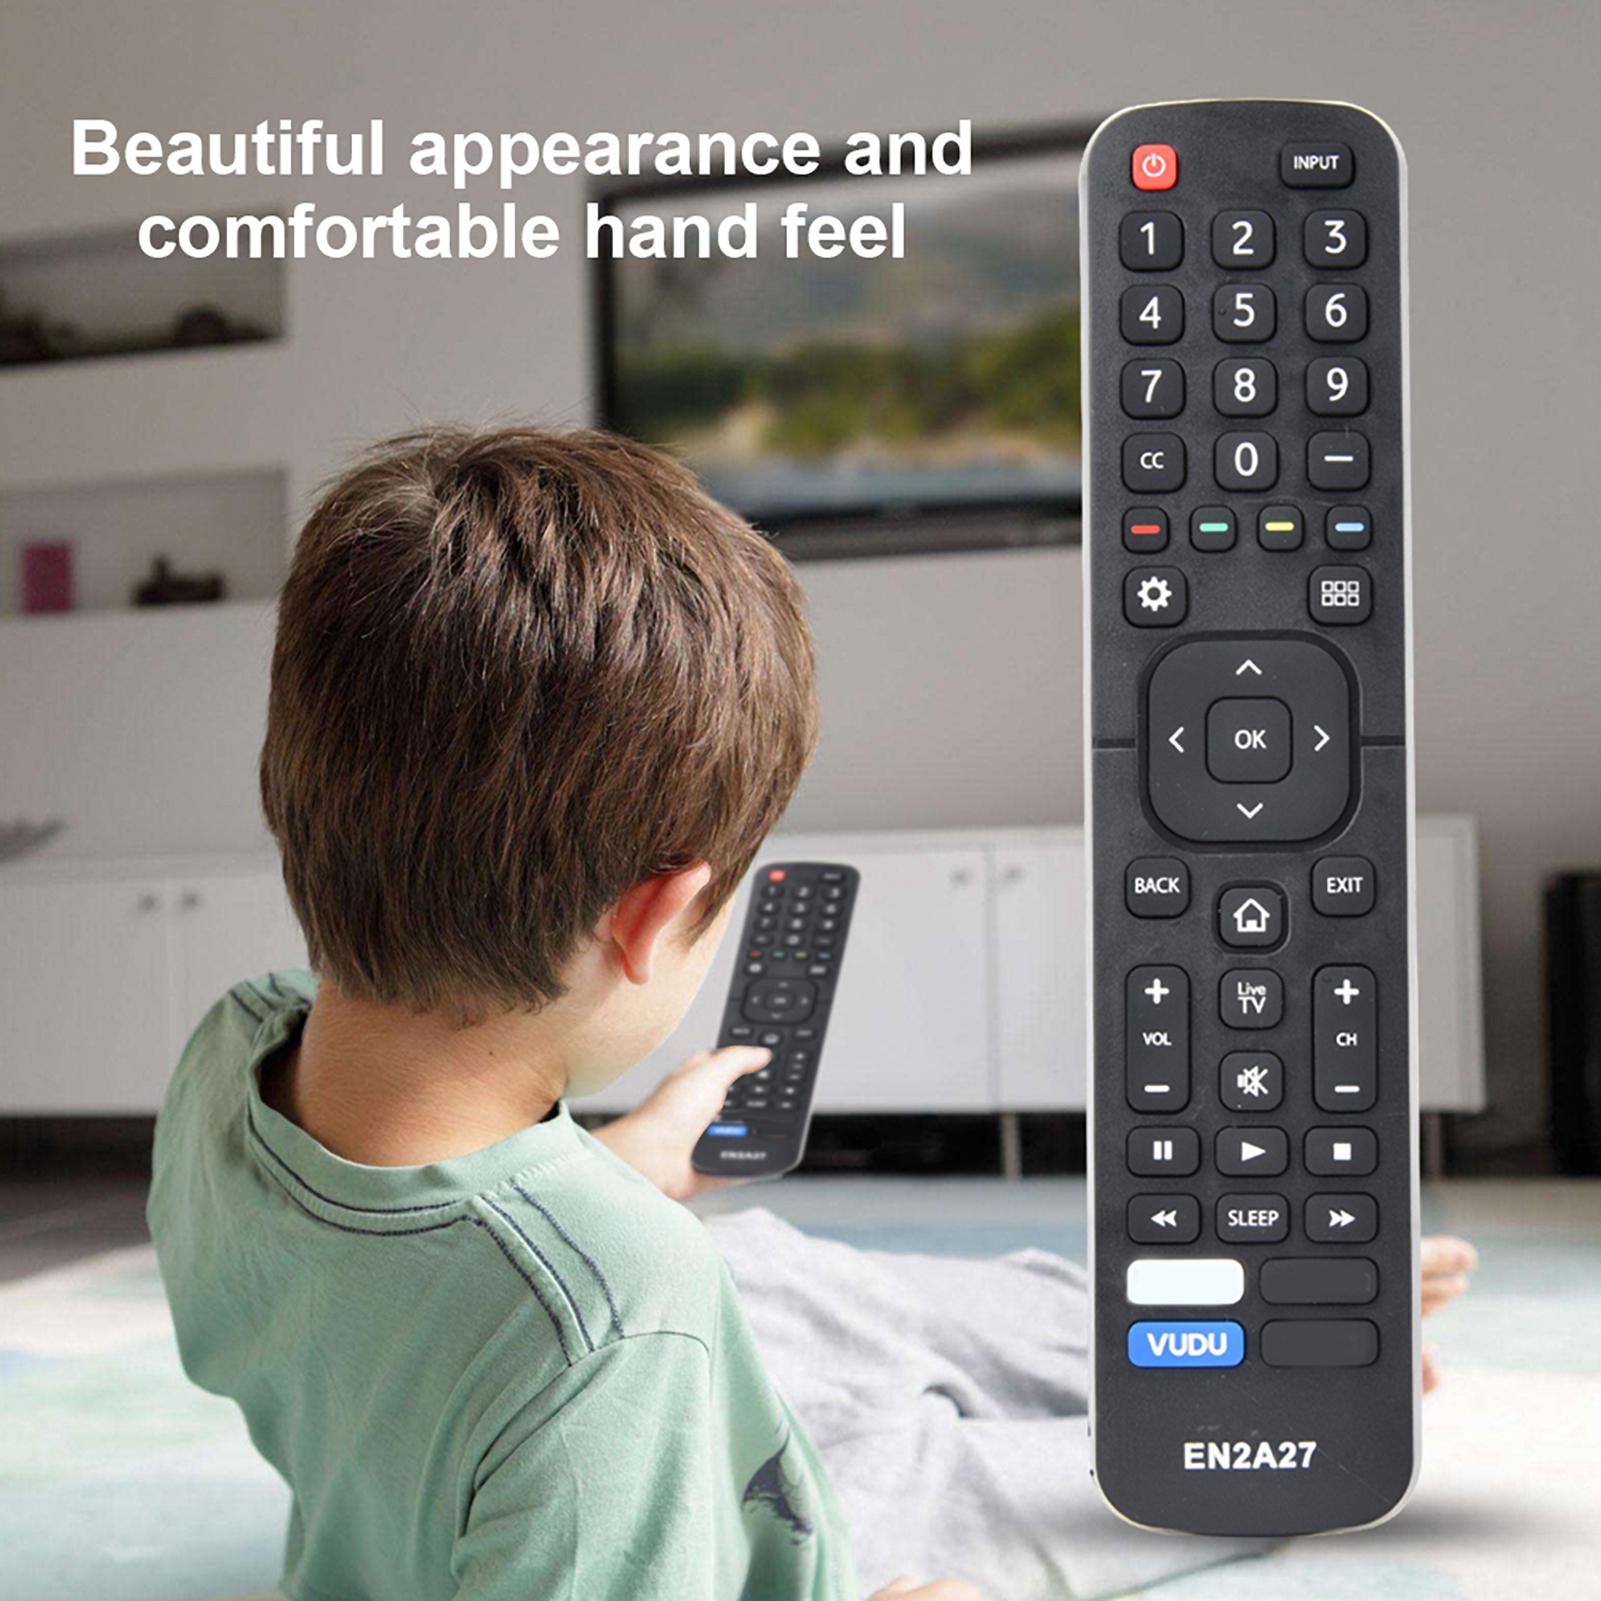 Indexbild 247 - Universal TV Remote Control for Sony Sharp Philips TCL Toshiba Hisense Hitachi